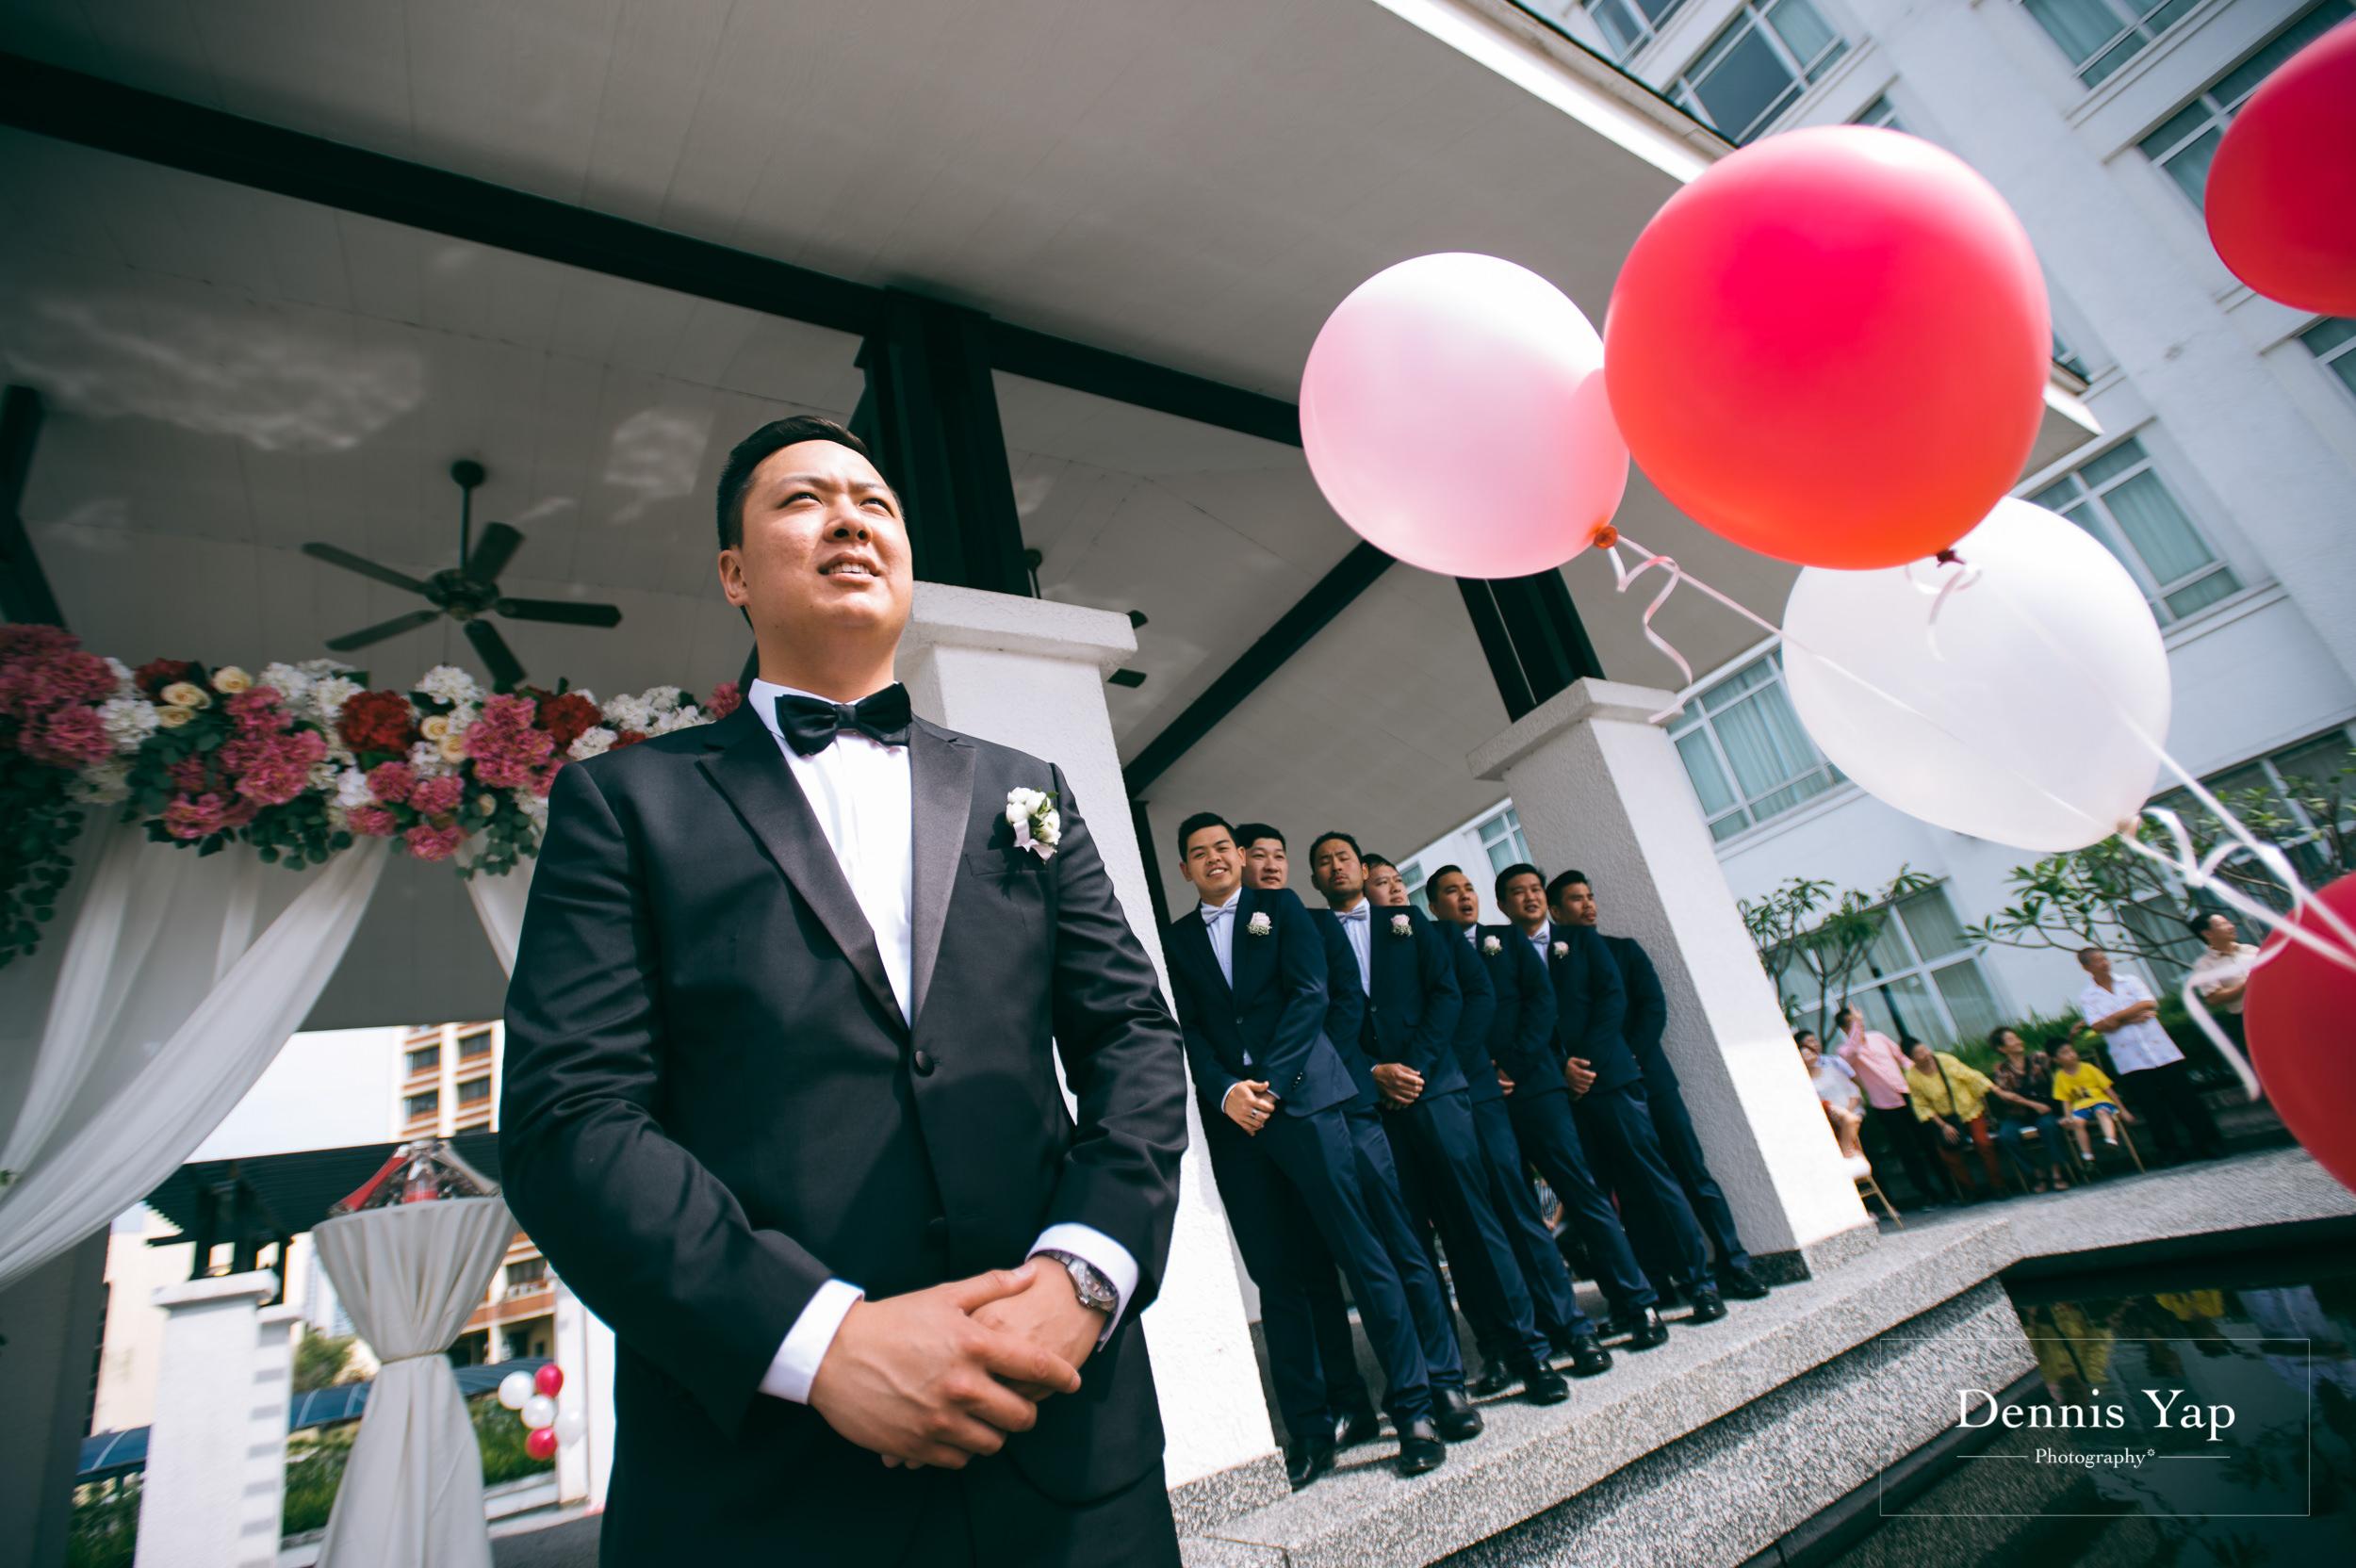 lionel joanne garden wedding majestic hotel dennis yap photography malaysia top wedding photographer-27.jpg